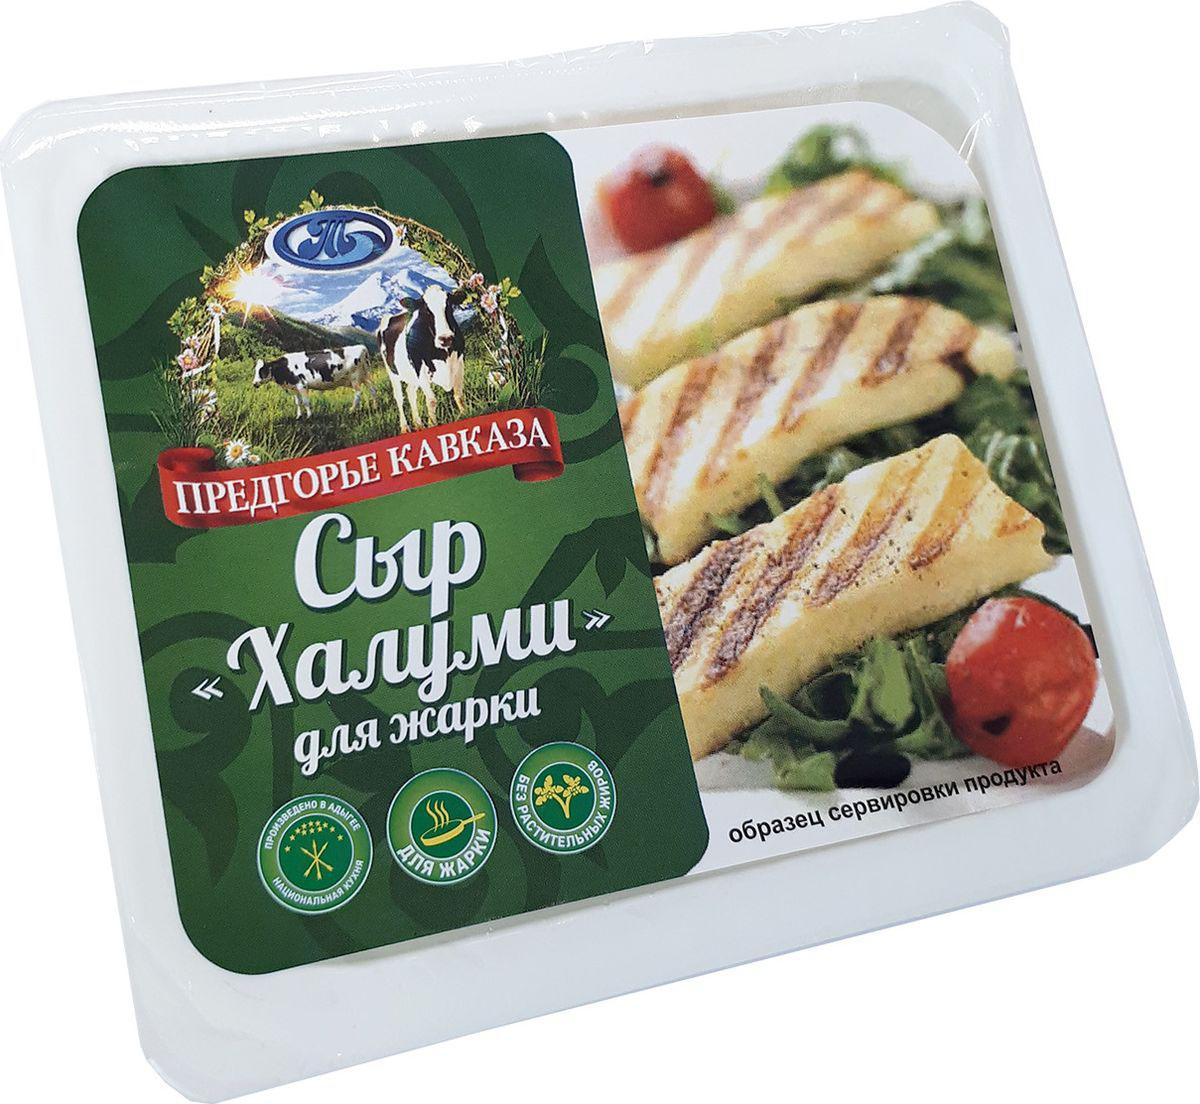 Предгорье Кавказа Сыр Халуми, 40%, 200 г le superb сыр диаболо гурме 200 г